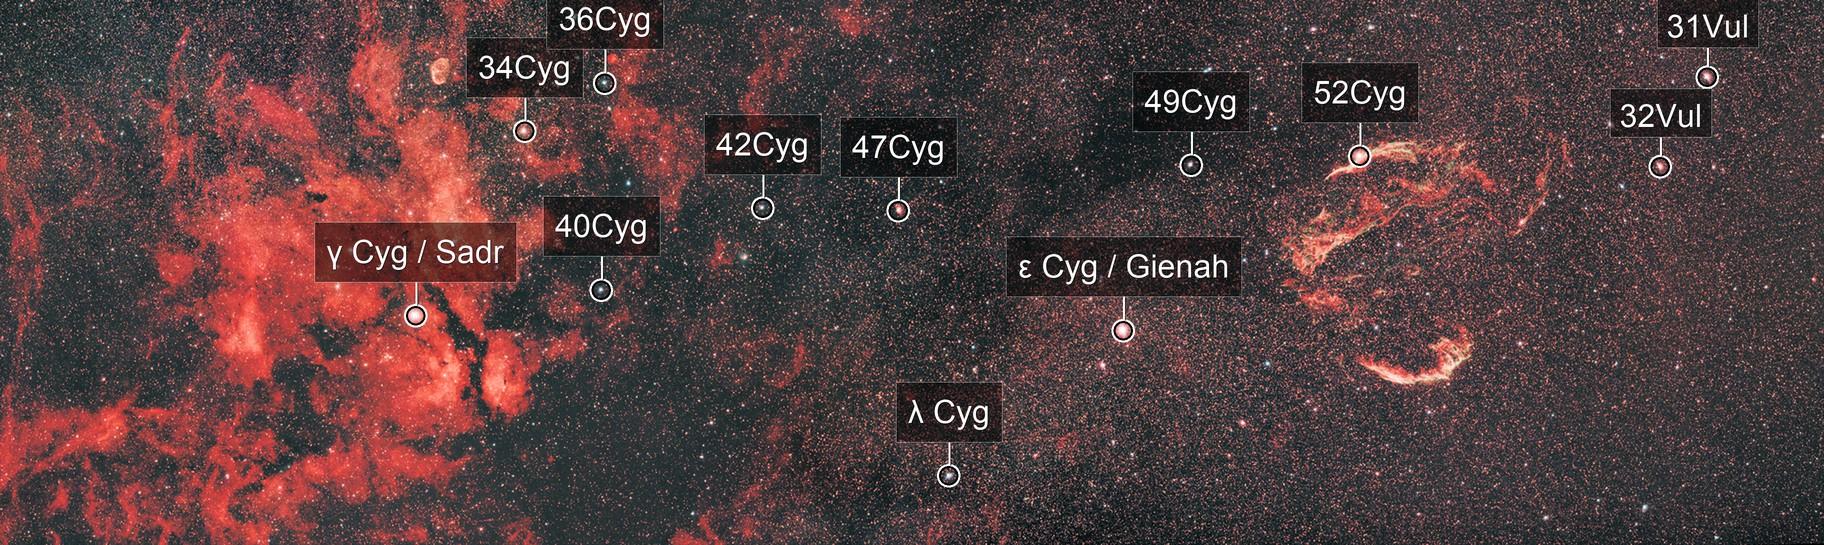 Gamma Cygni to the Veil Nebula